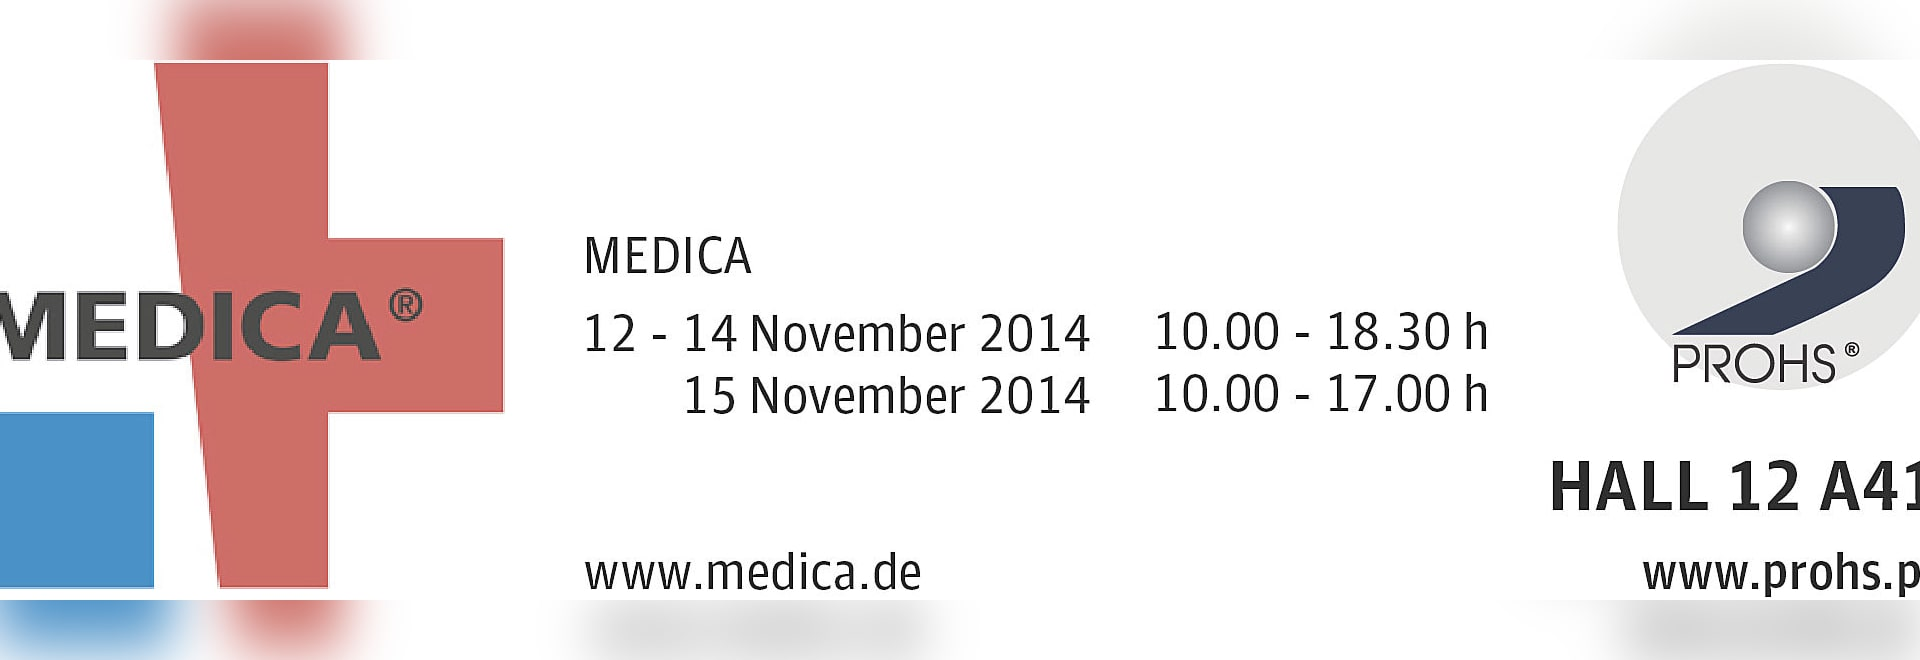 PROHS (Sterilization Equipment) at MEDICA 2014